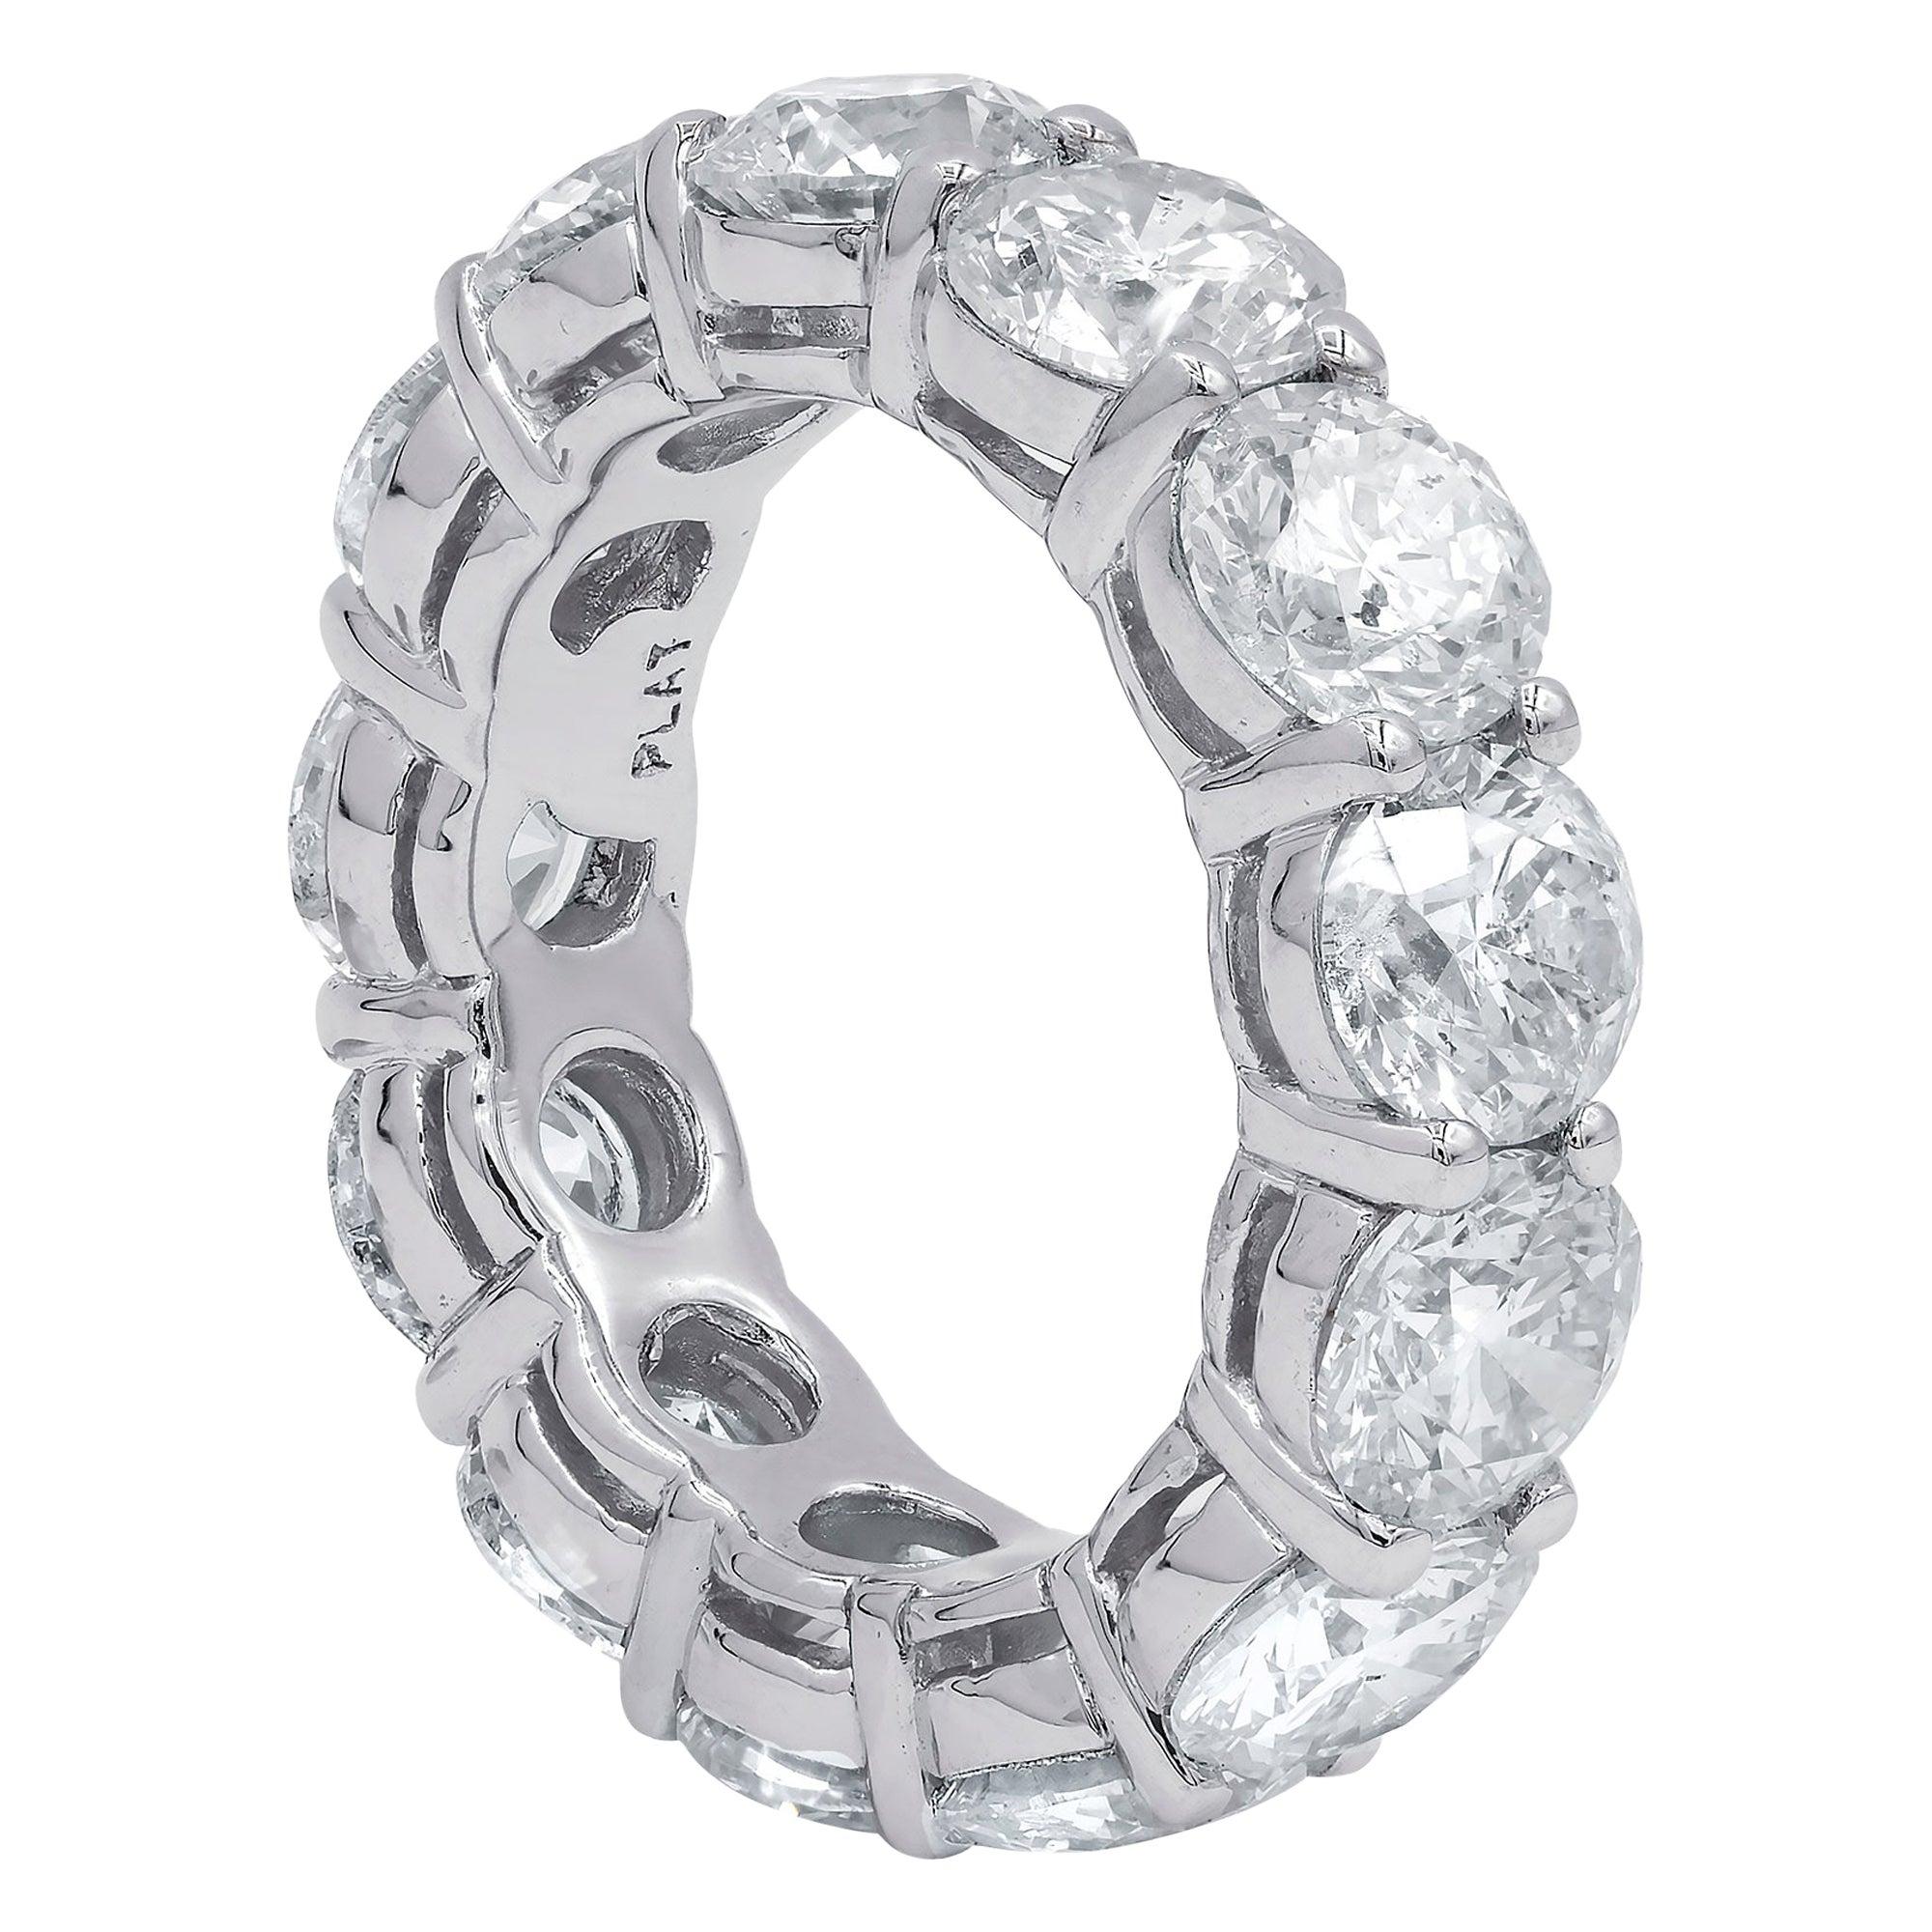 Platinum GIA Certified 13.14 Carat Diamond Eternity Band, 'D-F VVS-VS'